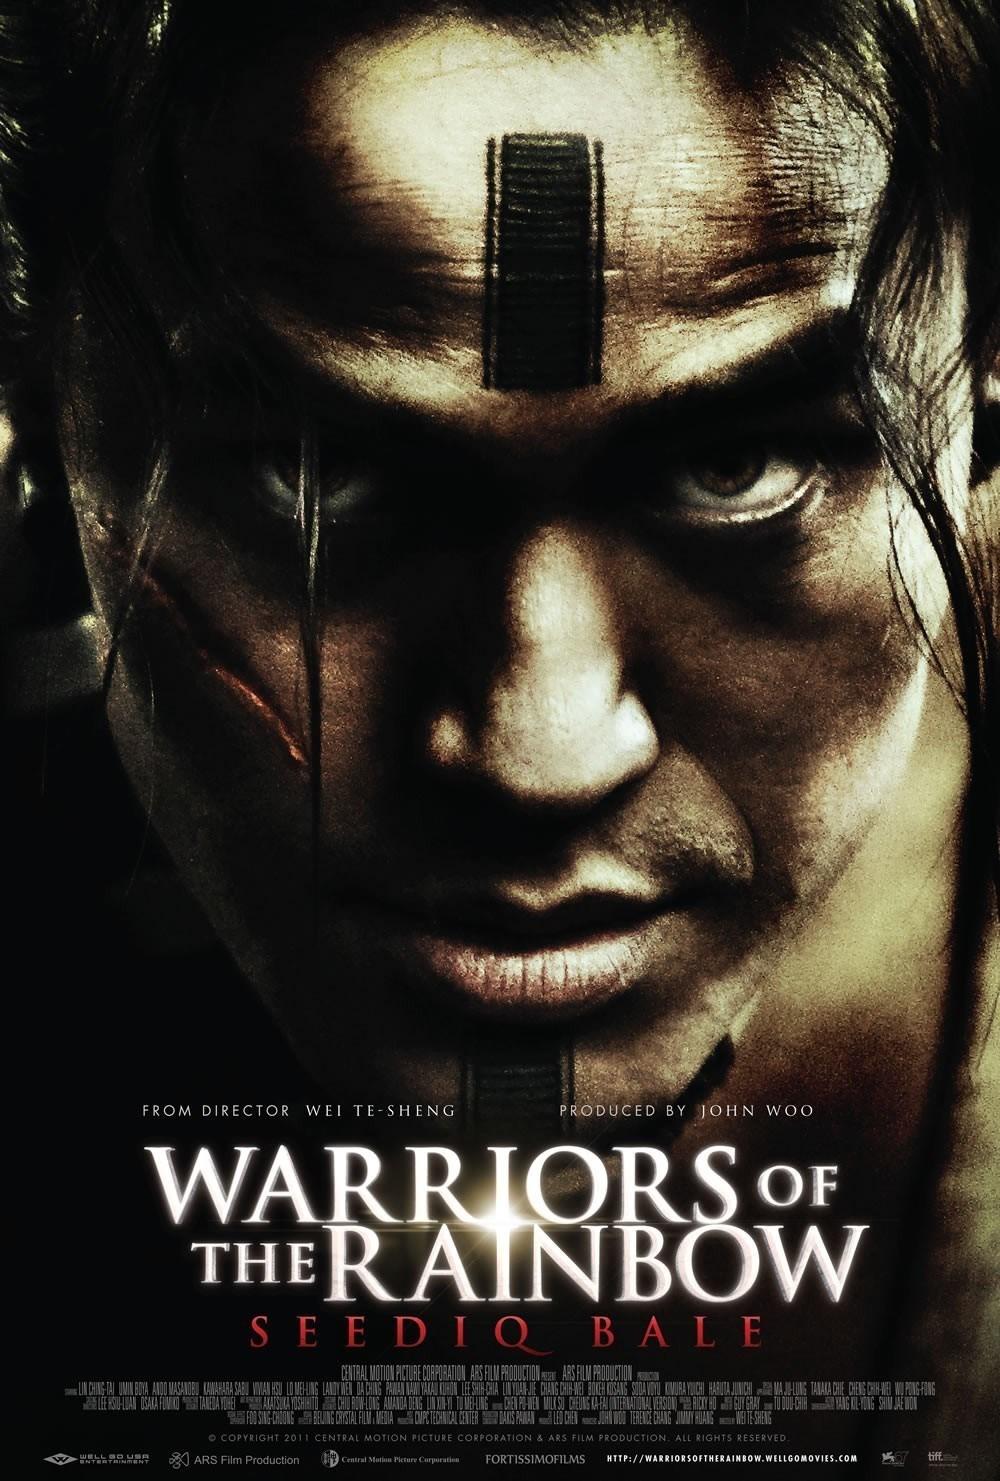 Watch Movie Warriors of the Rainbow Seediq Bale Part 1